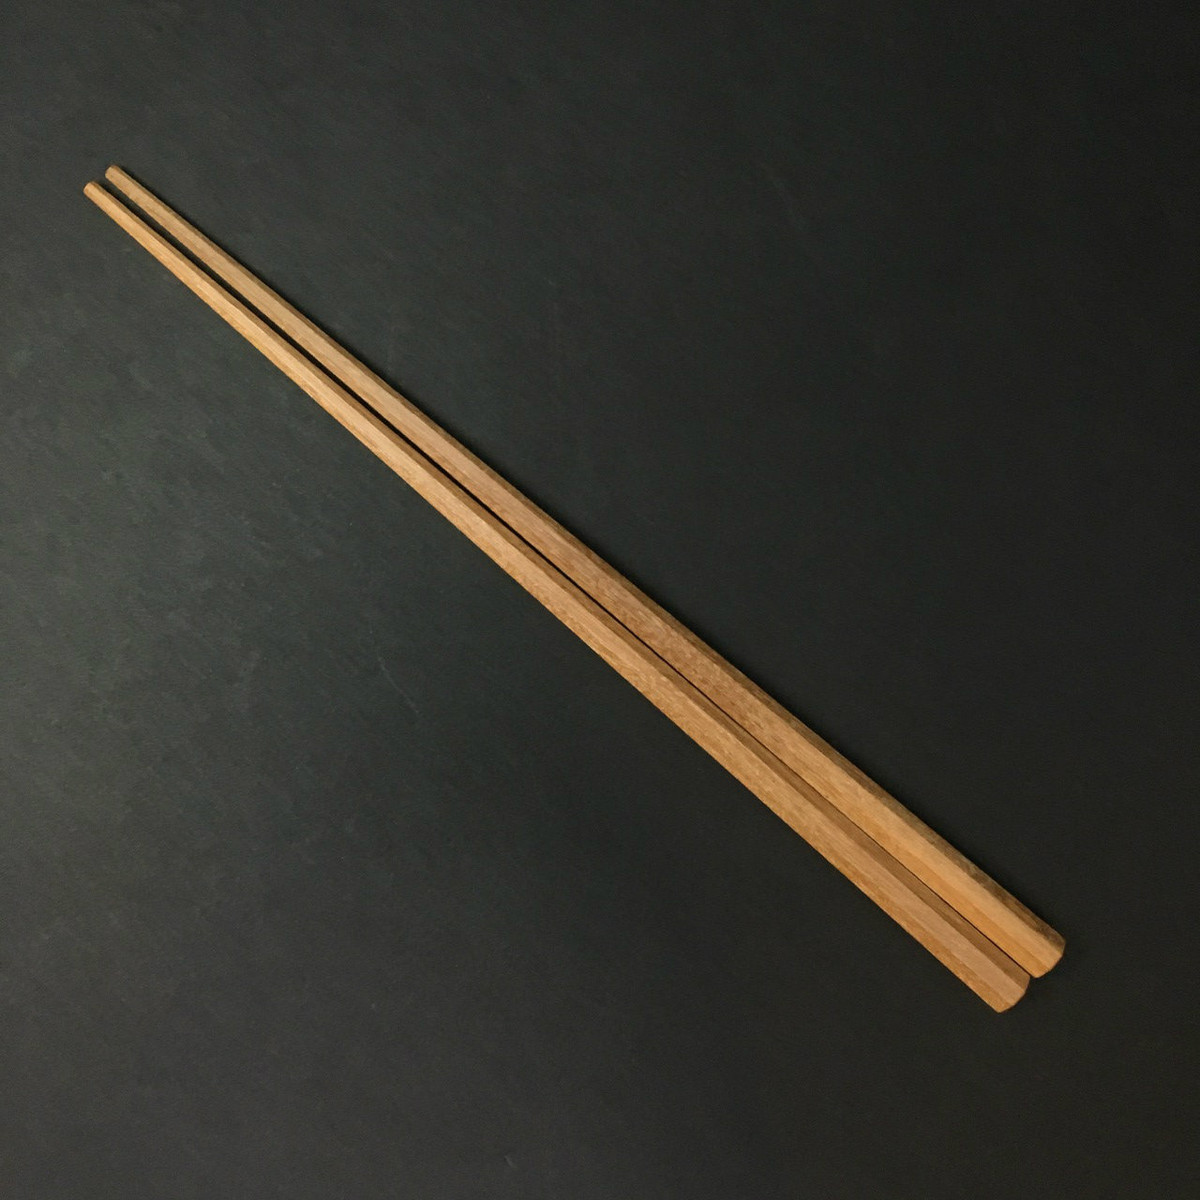 Marunao - Eight Sided Chopsticks - Standard Kumeawood - 220mm